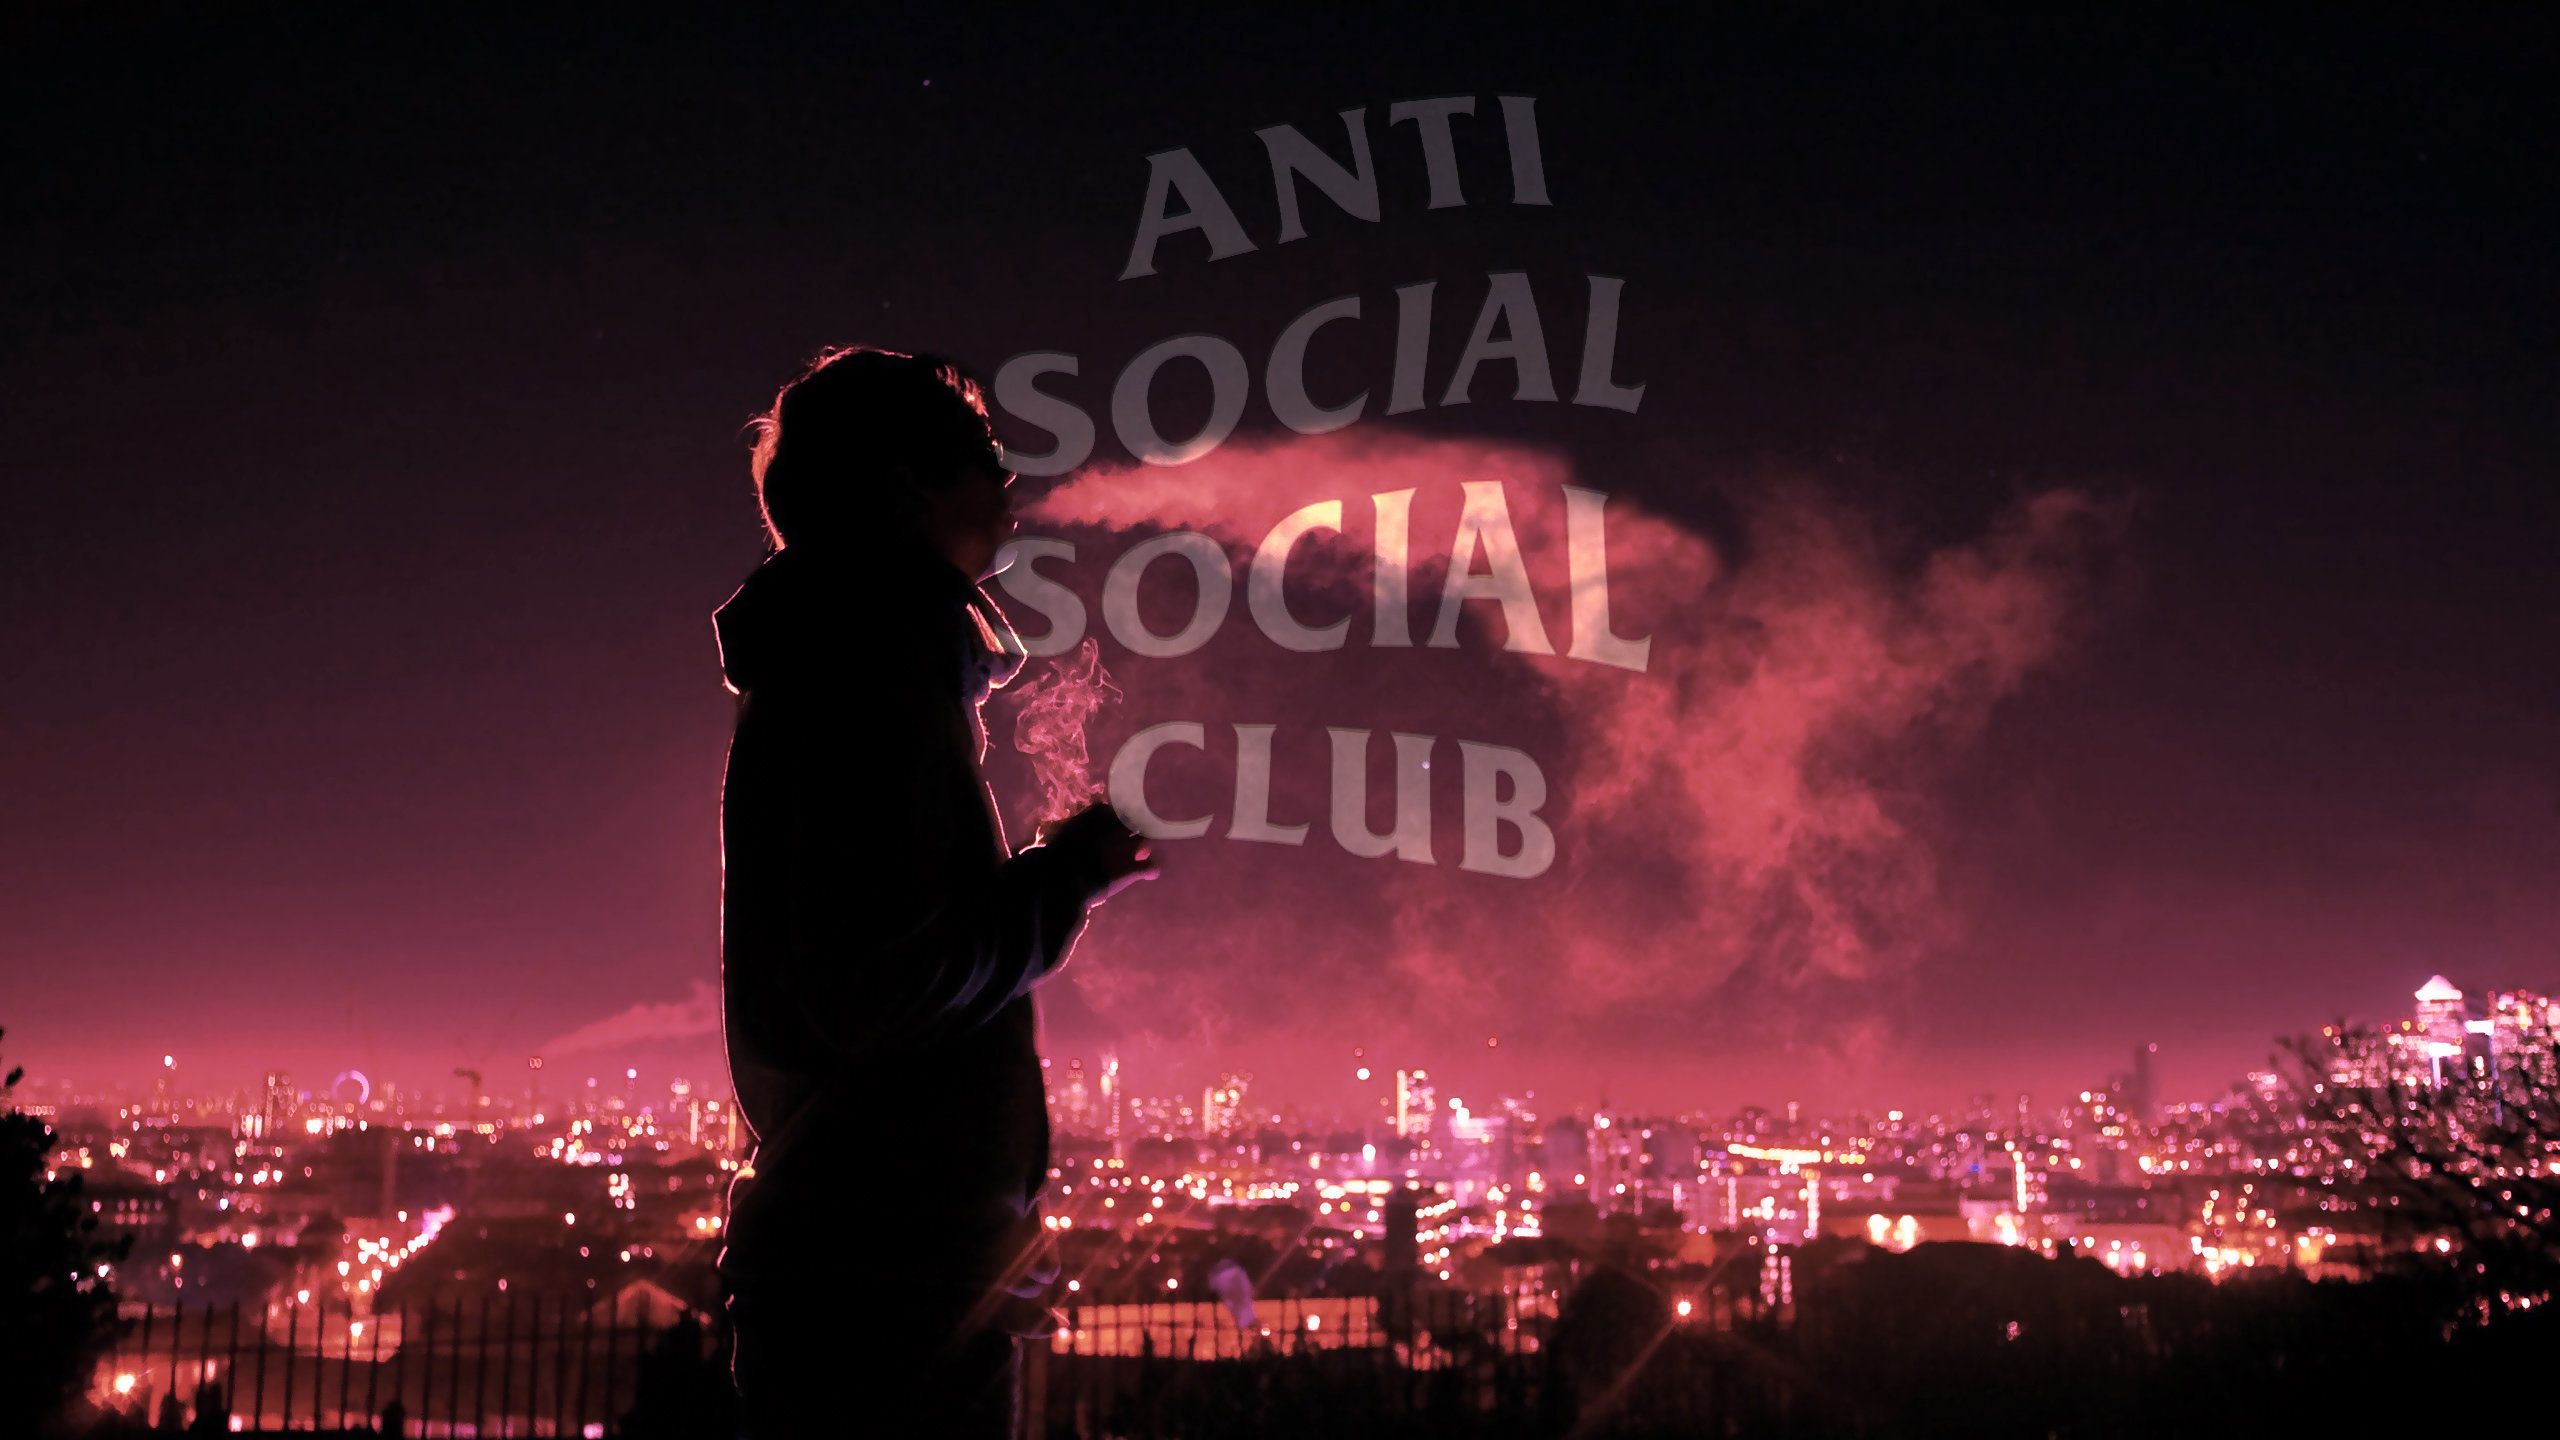 Anti Social Social Club Computer Wallpapers - Wallpaper Cave